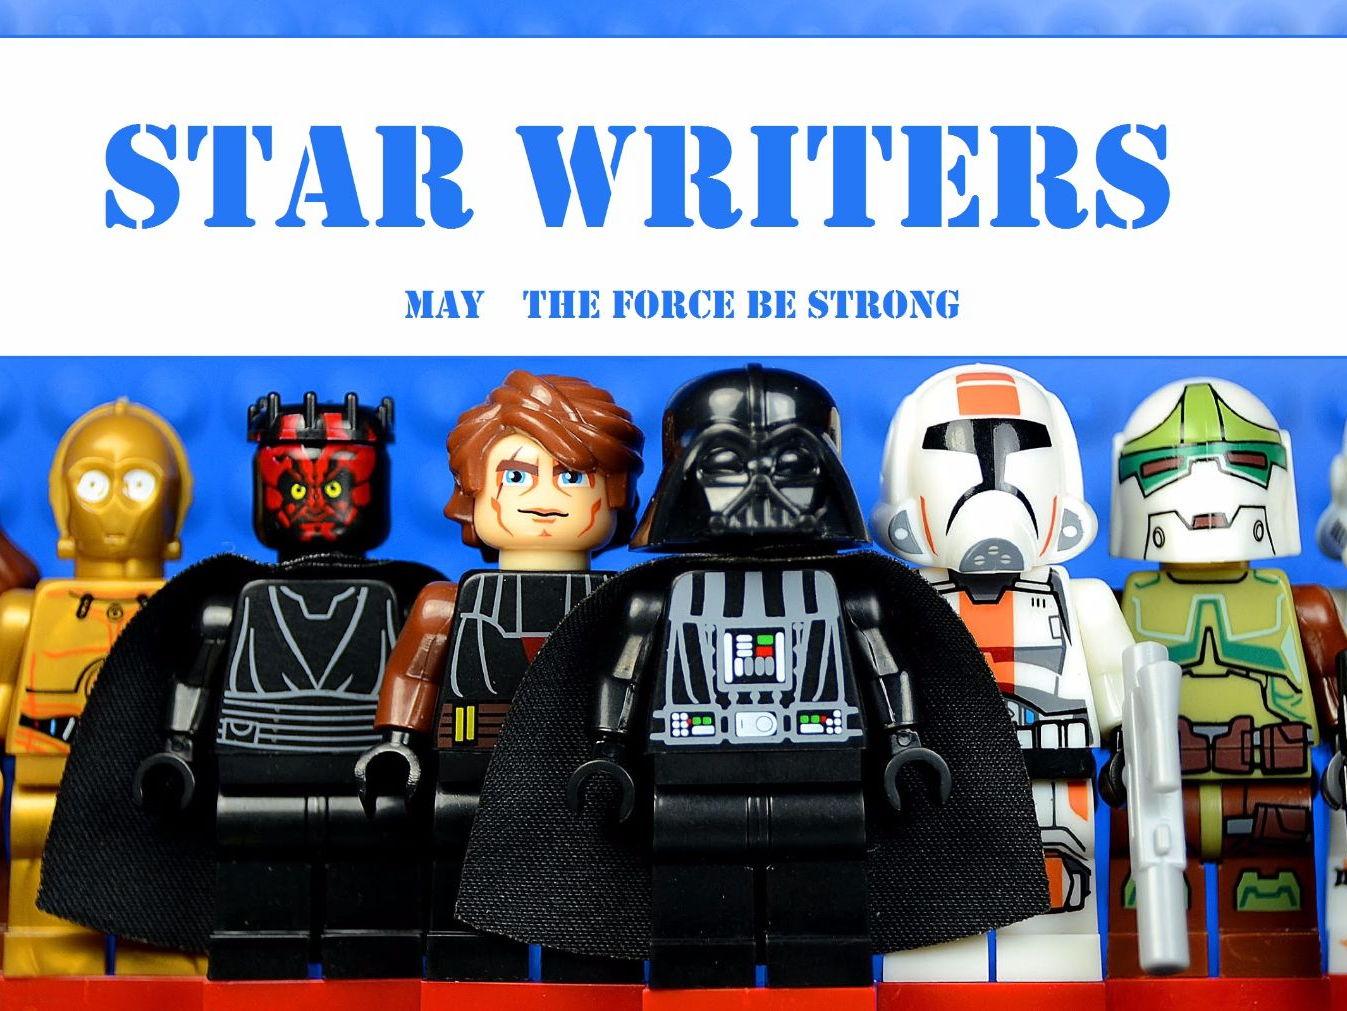 Star Wars Themed KS2 Writing Teacher Assessment record sheet bundle